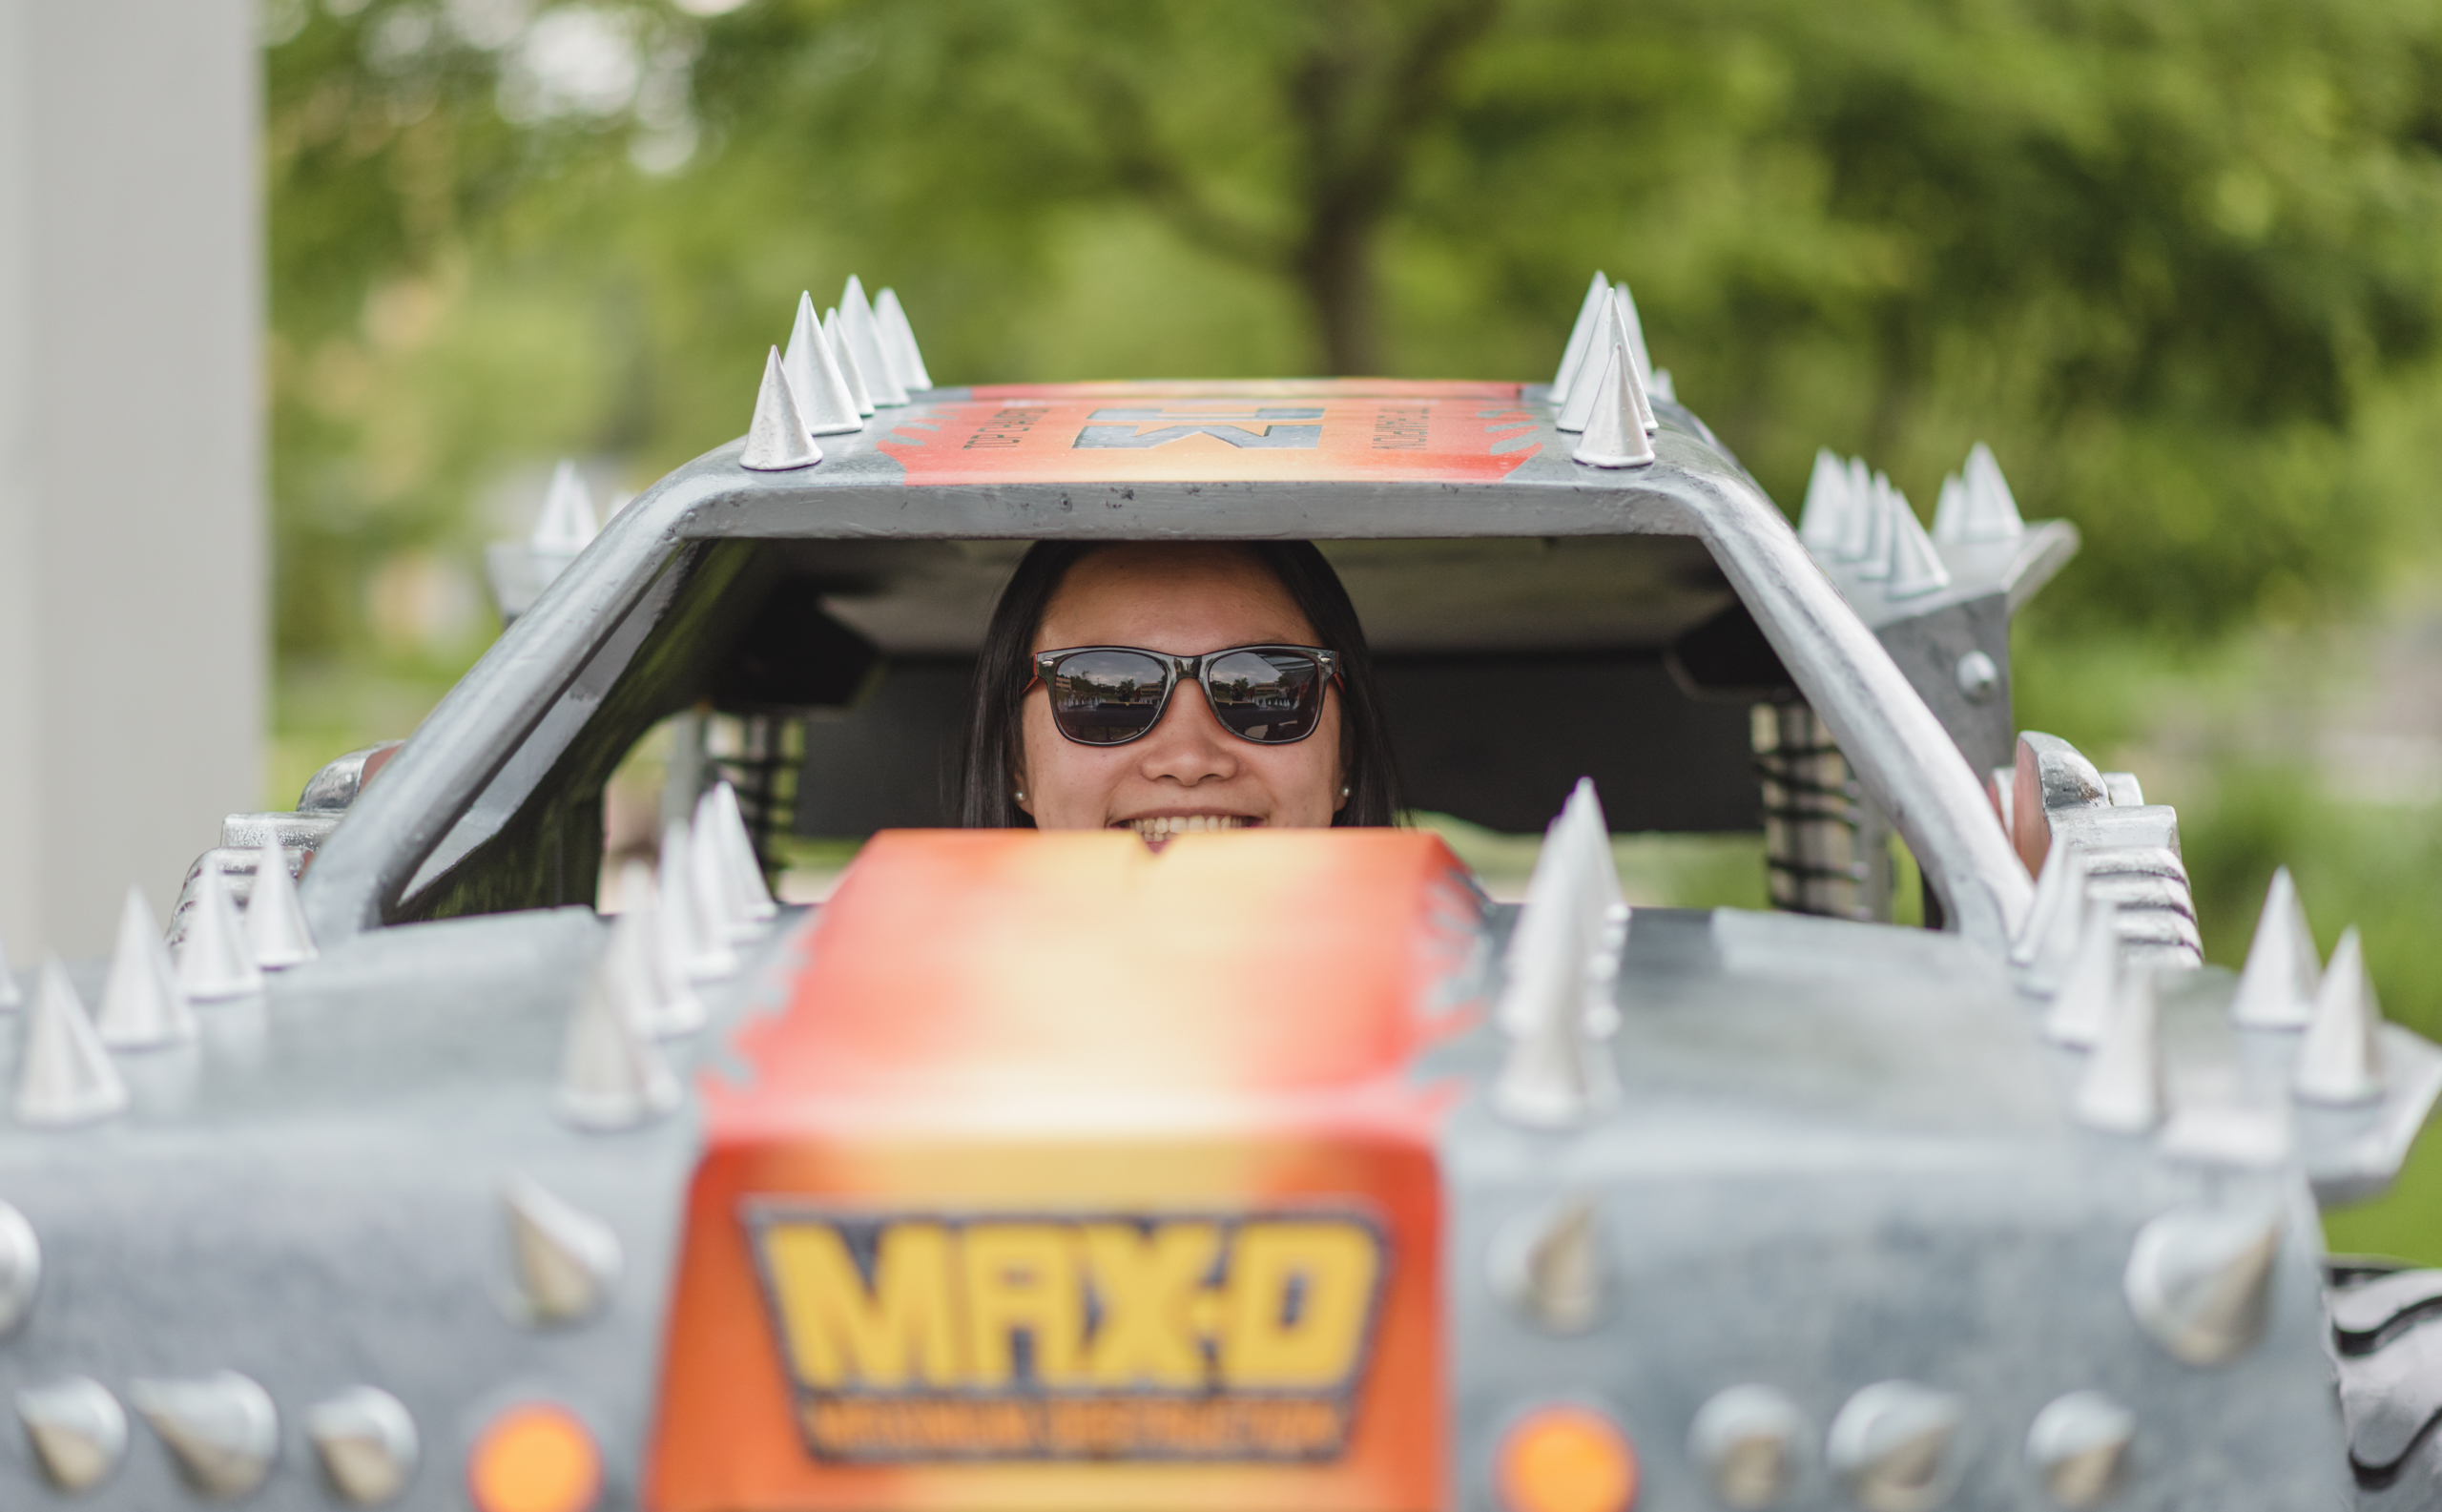 Team leader Chinloo cruising in the mini-Max-D